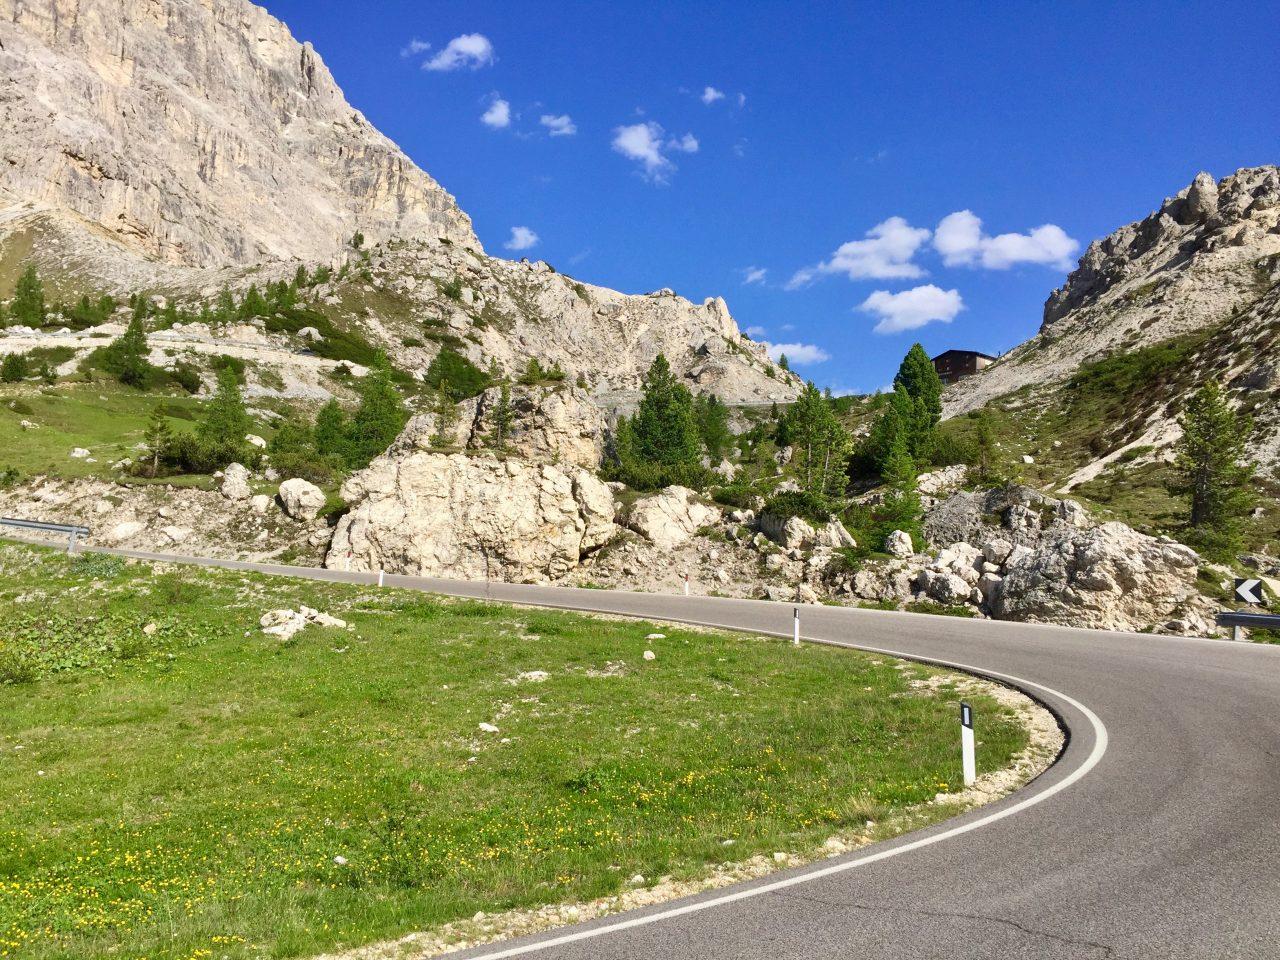 Auffahrt Passo Valparola, Dolomites, Italy